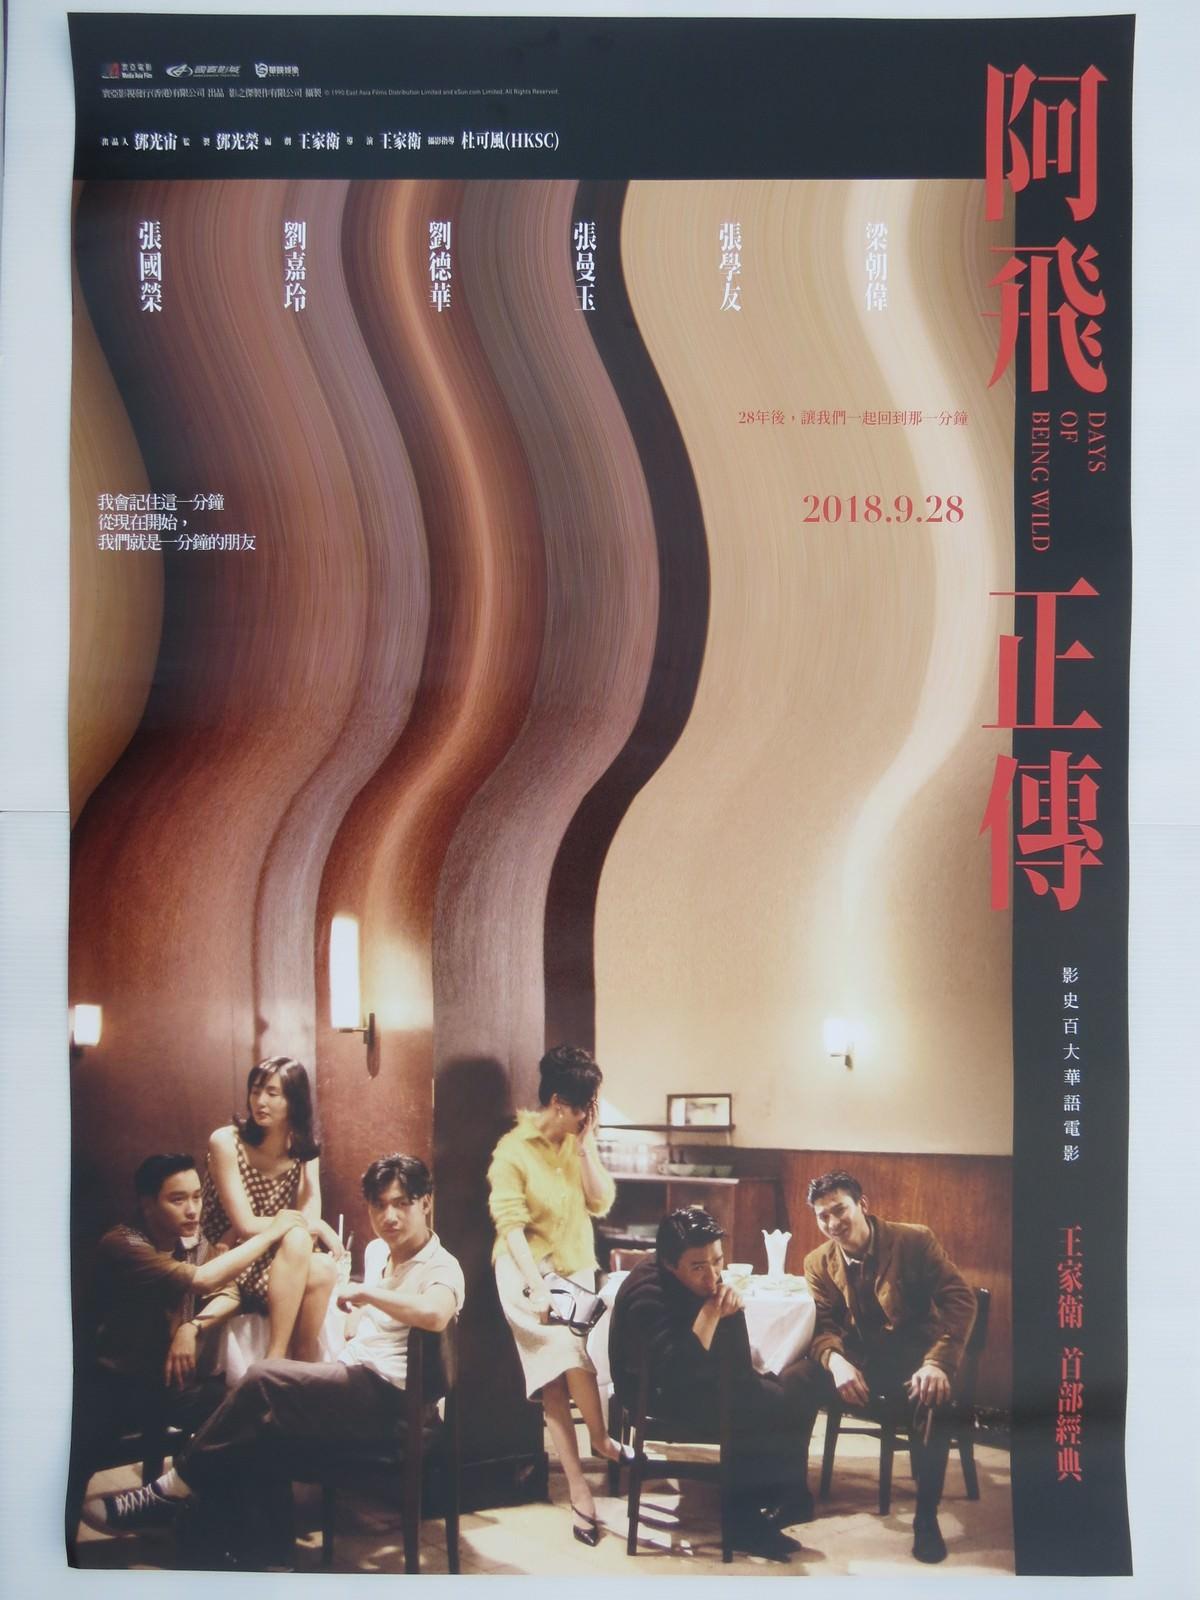 Movie, 阿飛正傳(香港, 1990) / 阿飛正傳(台灣) / 阿飞正传(中國) / Days of Being Wild(英文), 原版電影海報